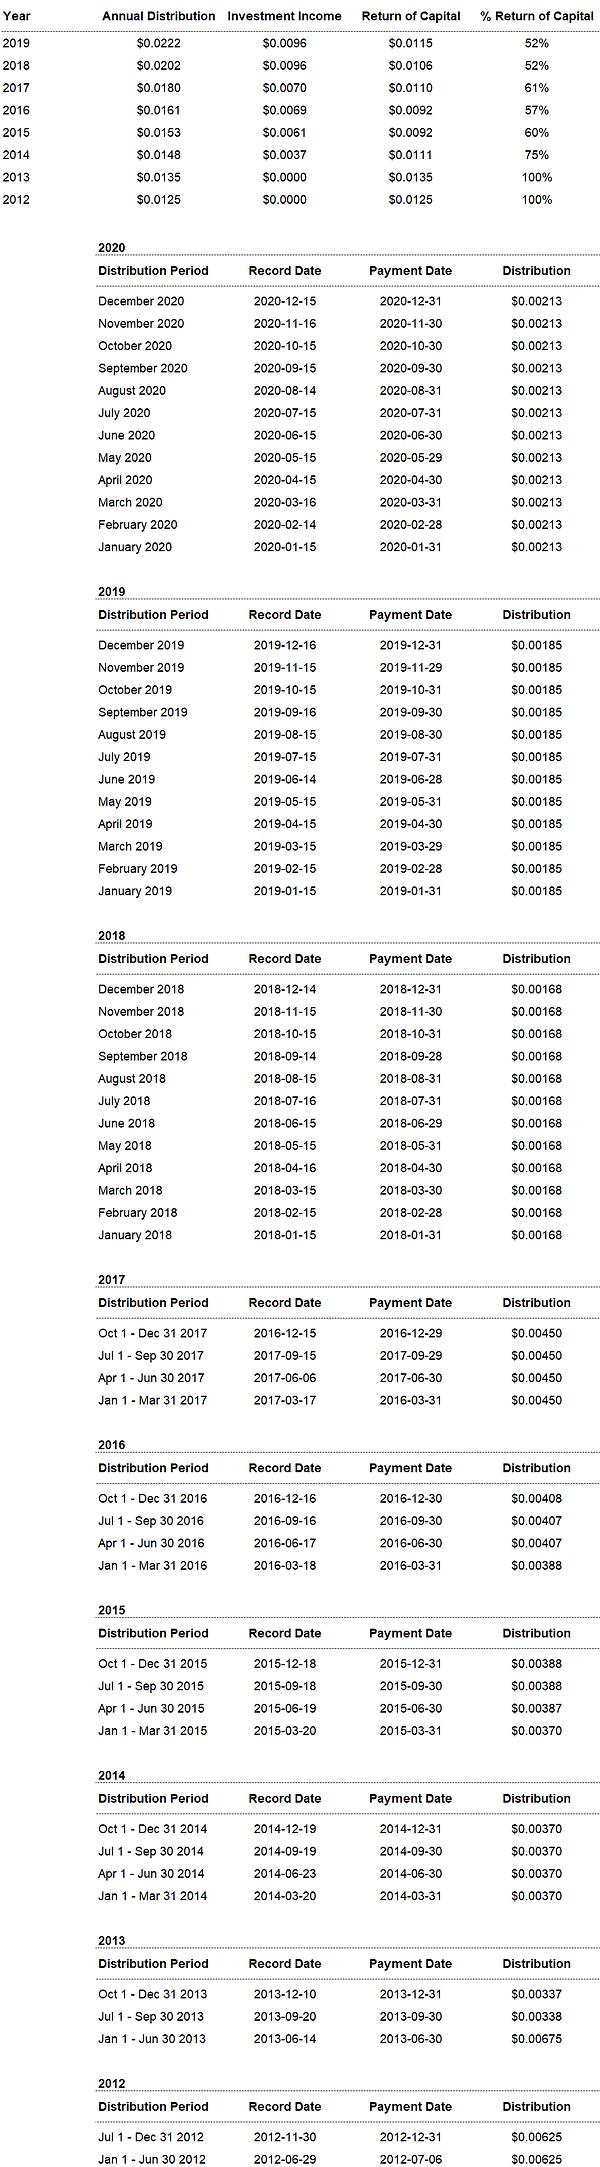 2020 Q4 Distributions.png